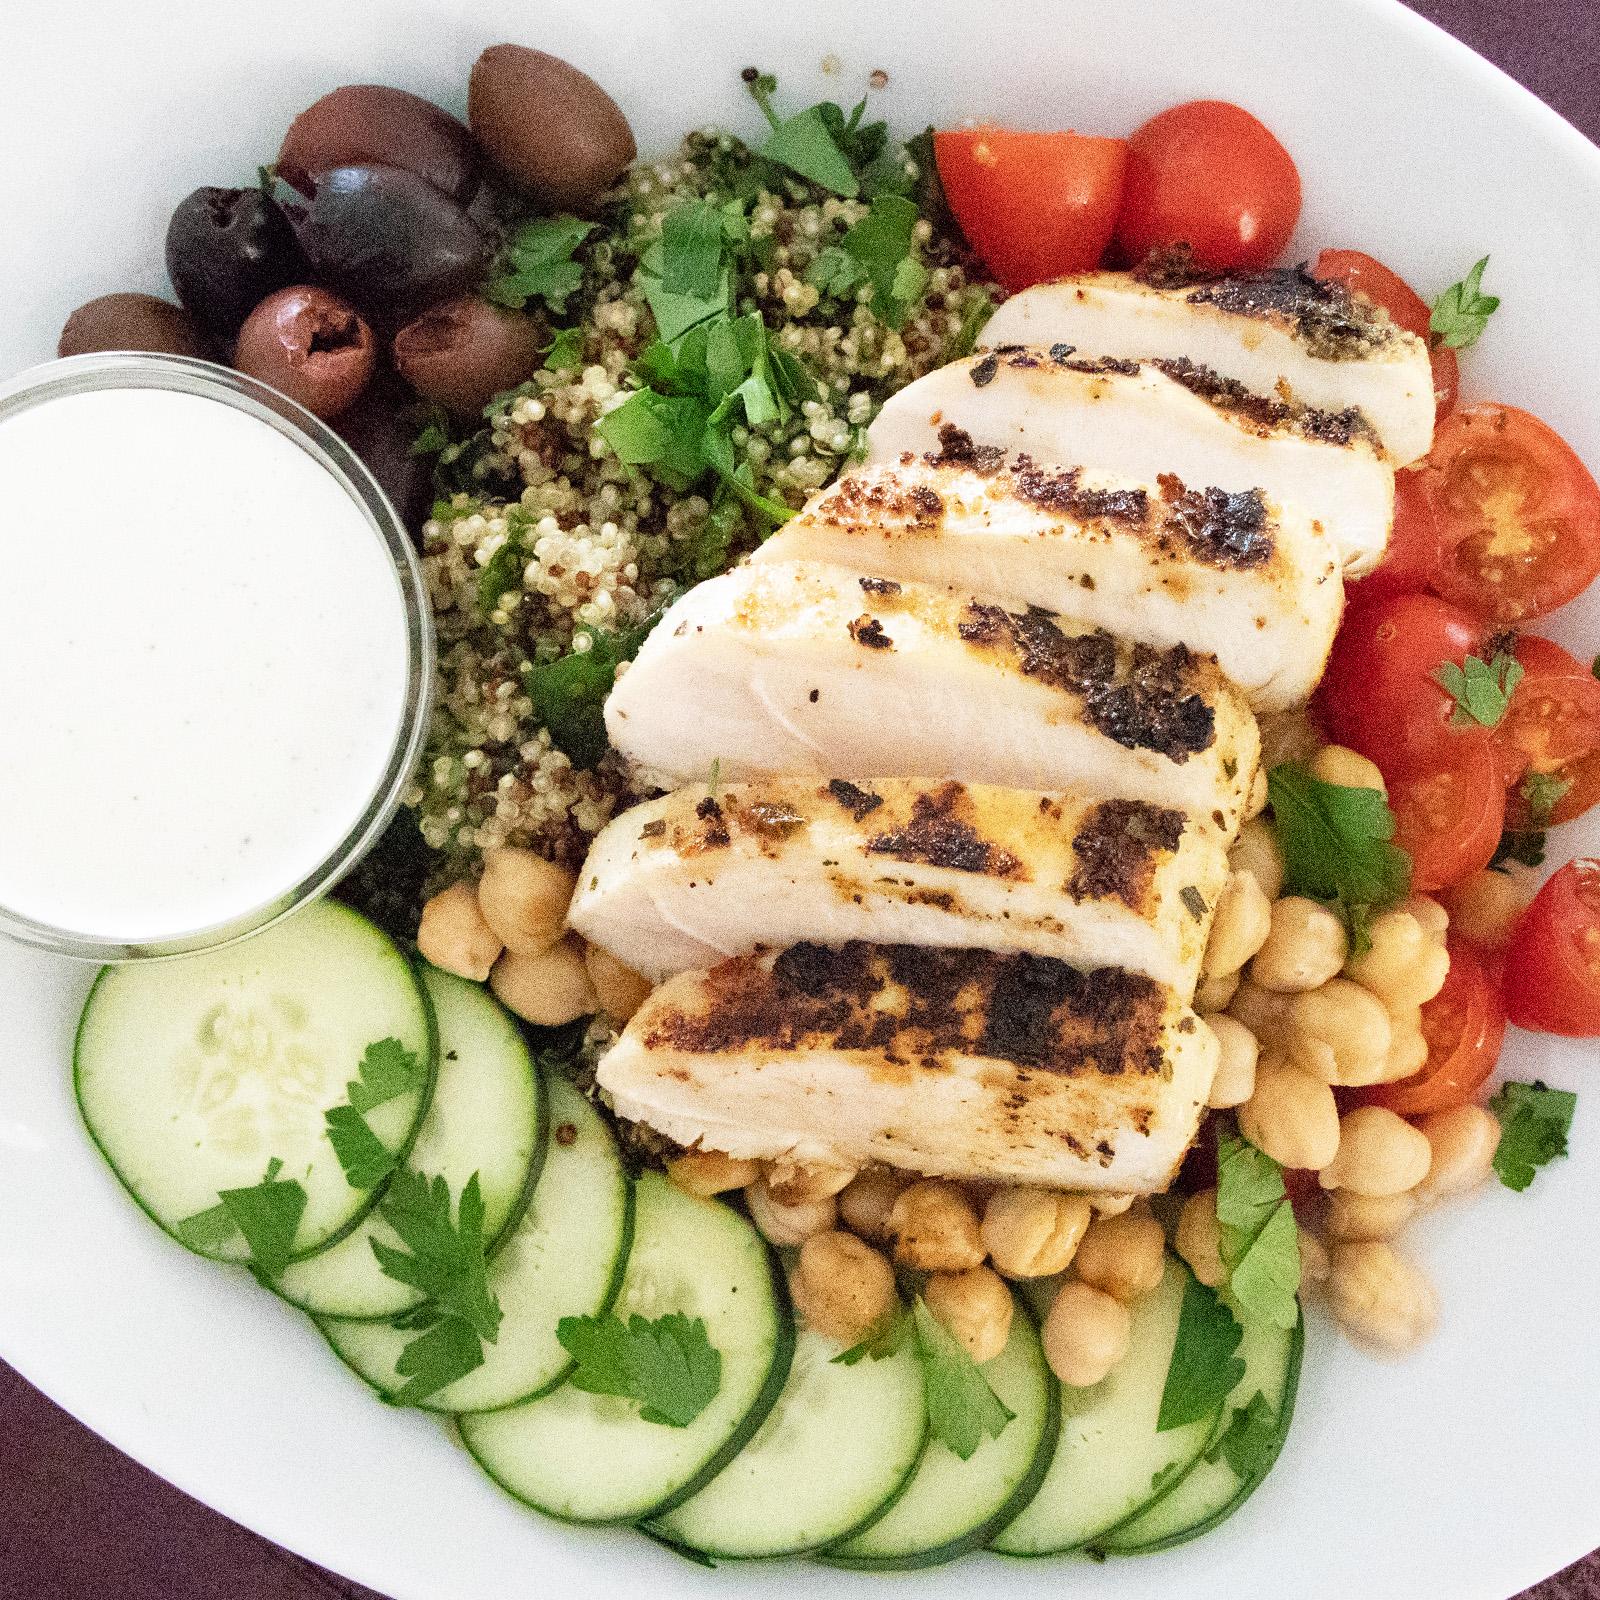 Greek Chicken Bowls With Chickpeas, Kale & Feta Sauce